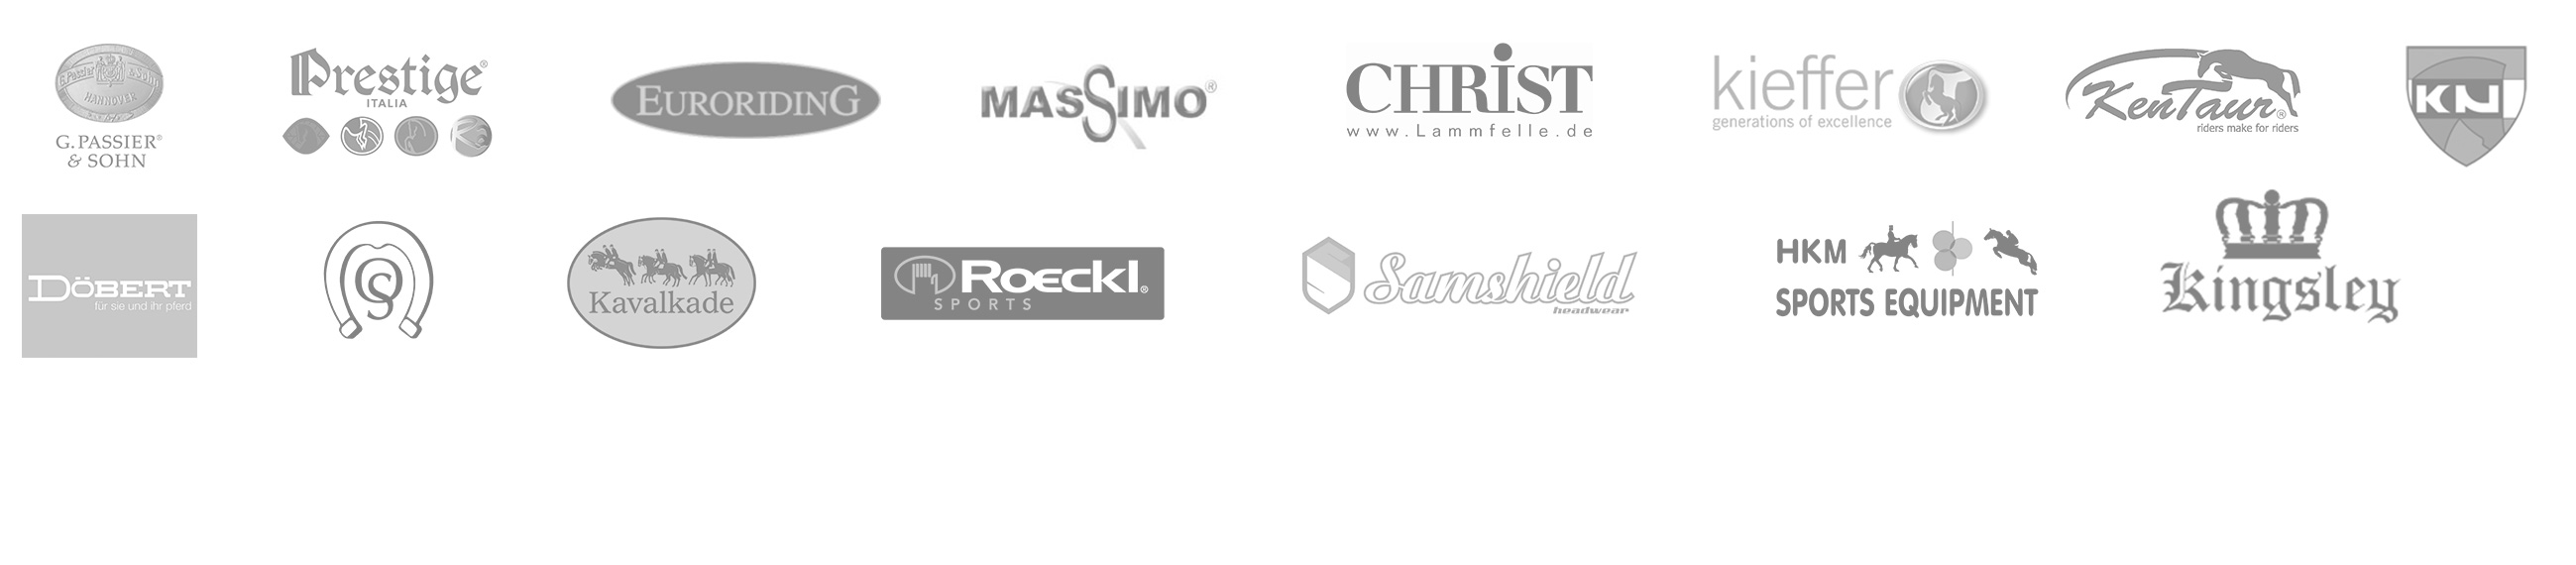 Reitsport Toscaninihof - Partner - Logos